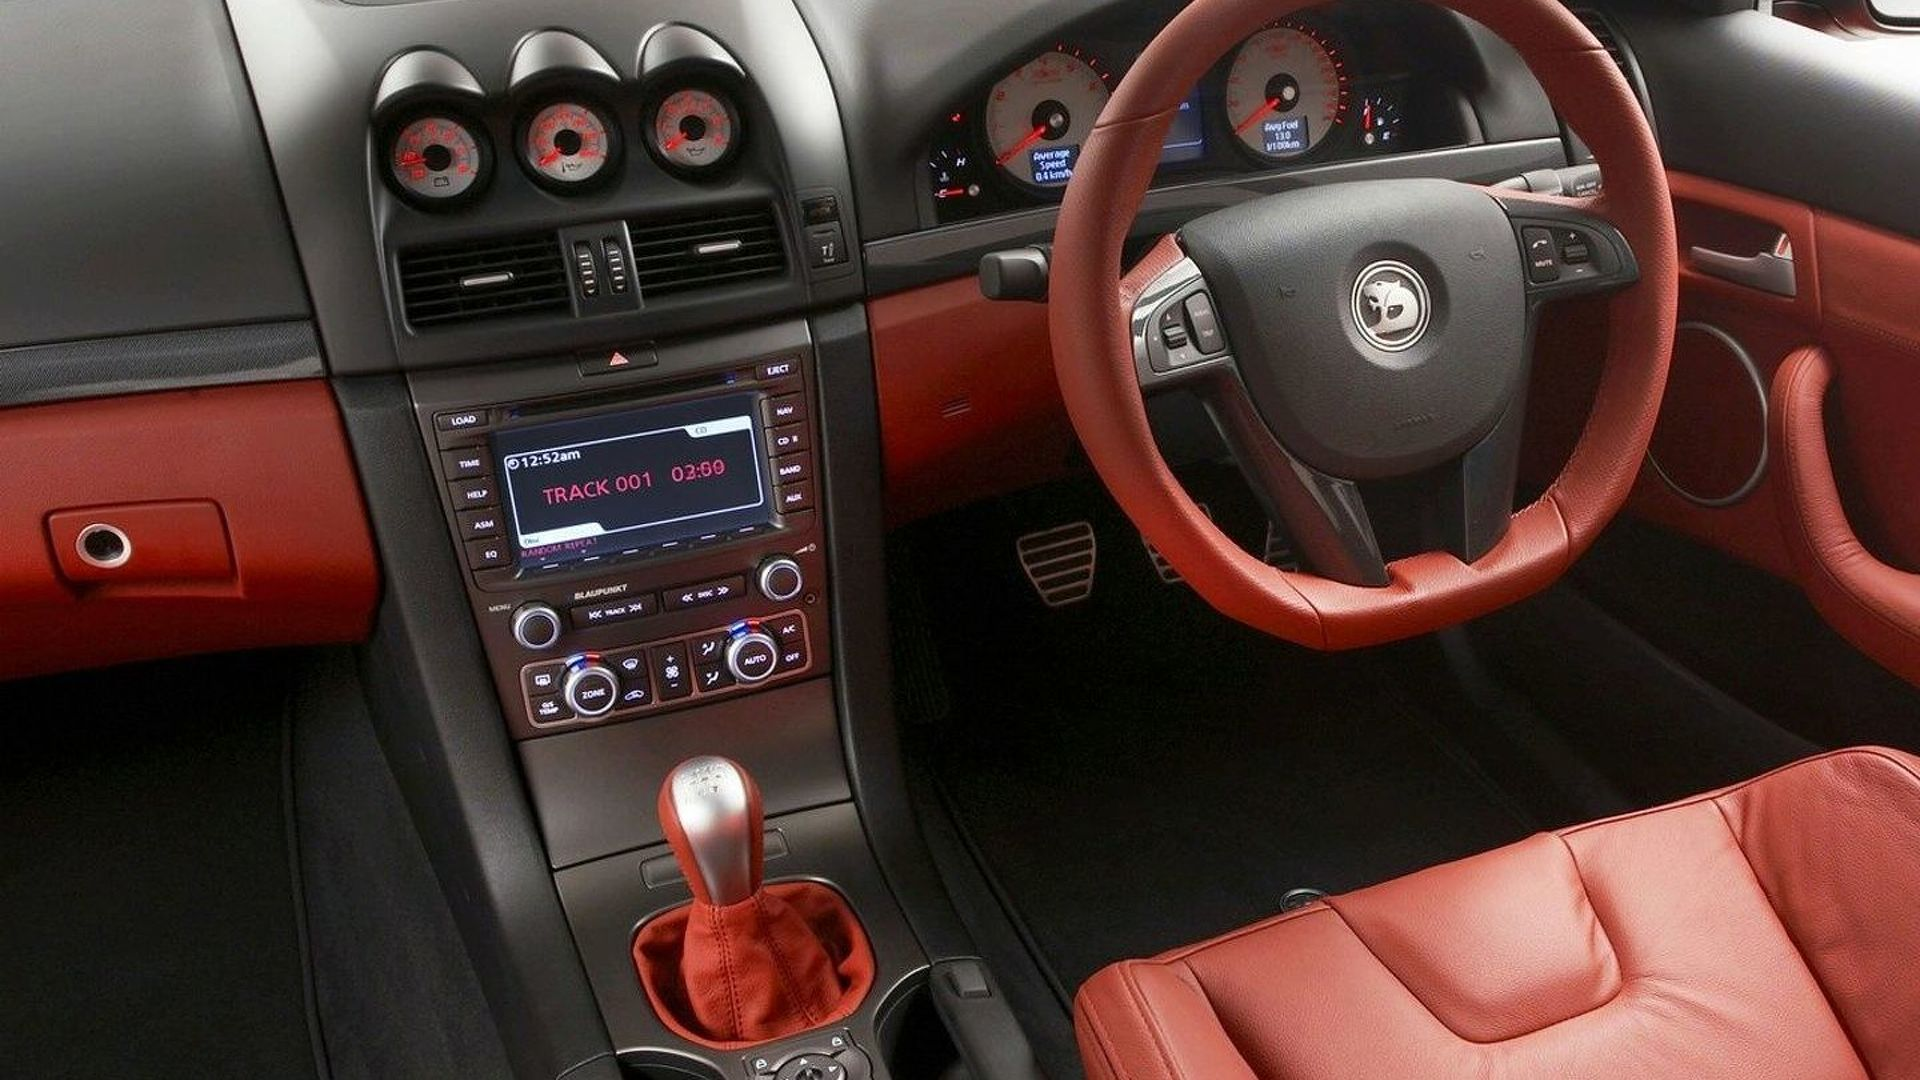 Holden HSV W427 Finally Goes on Sale